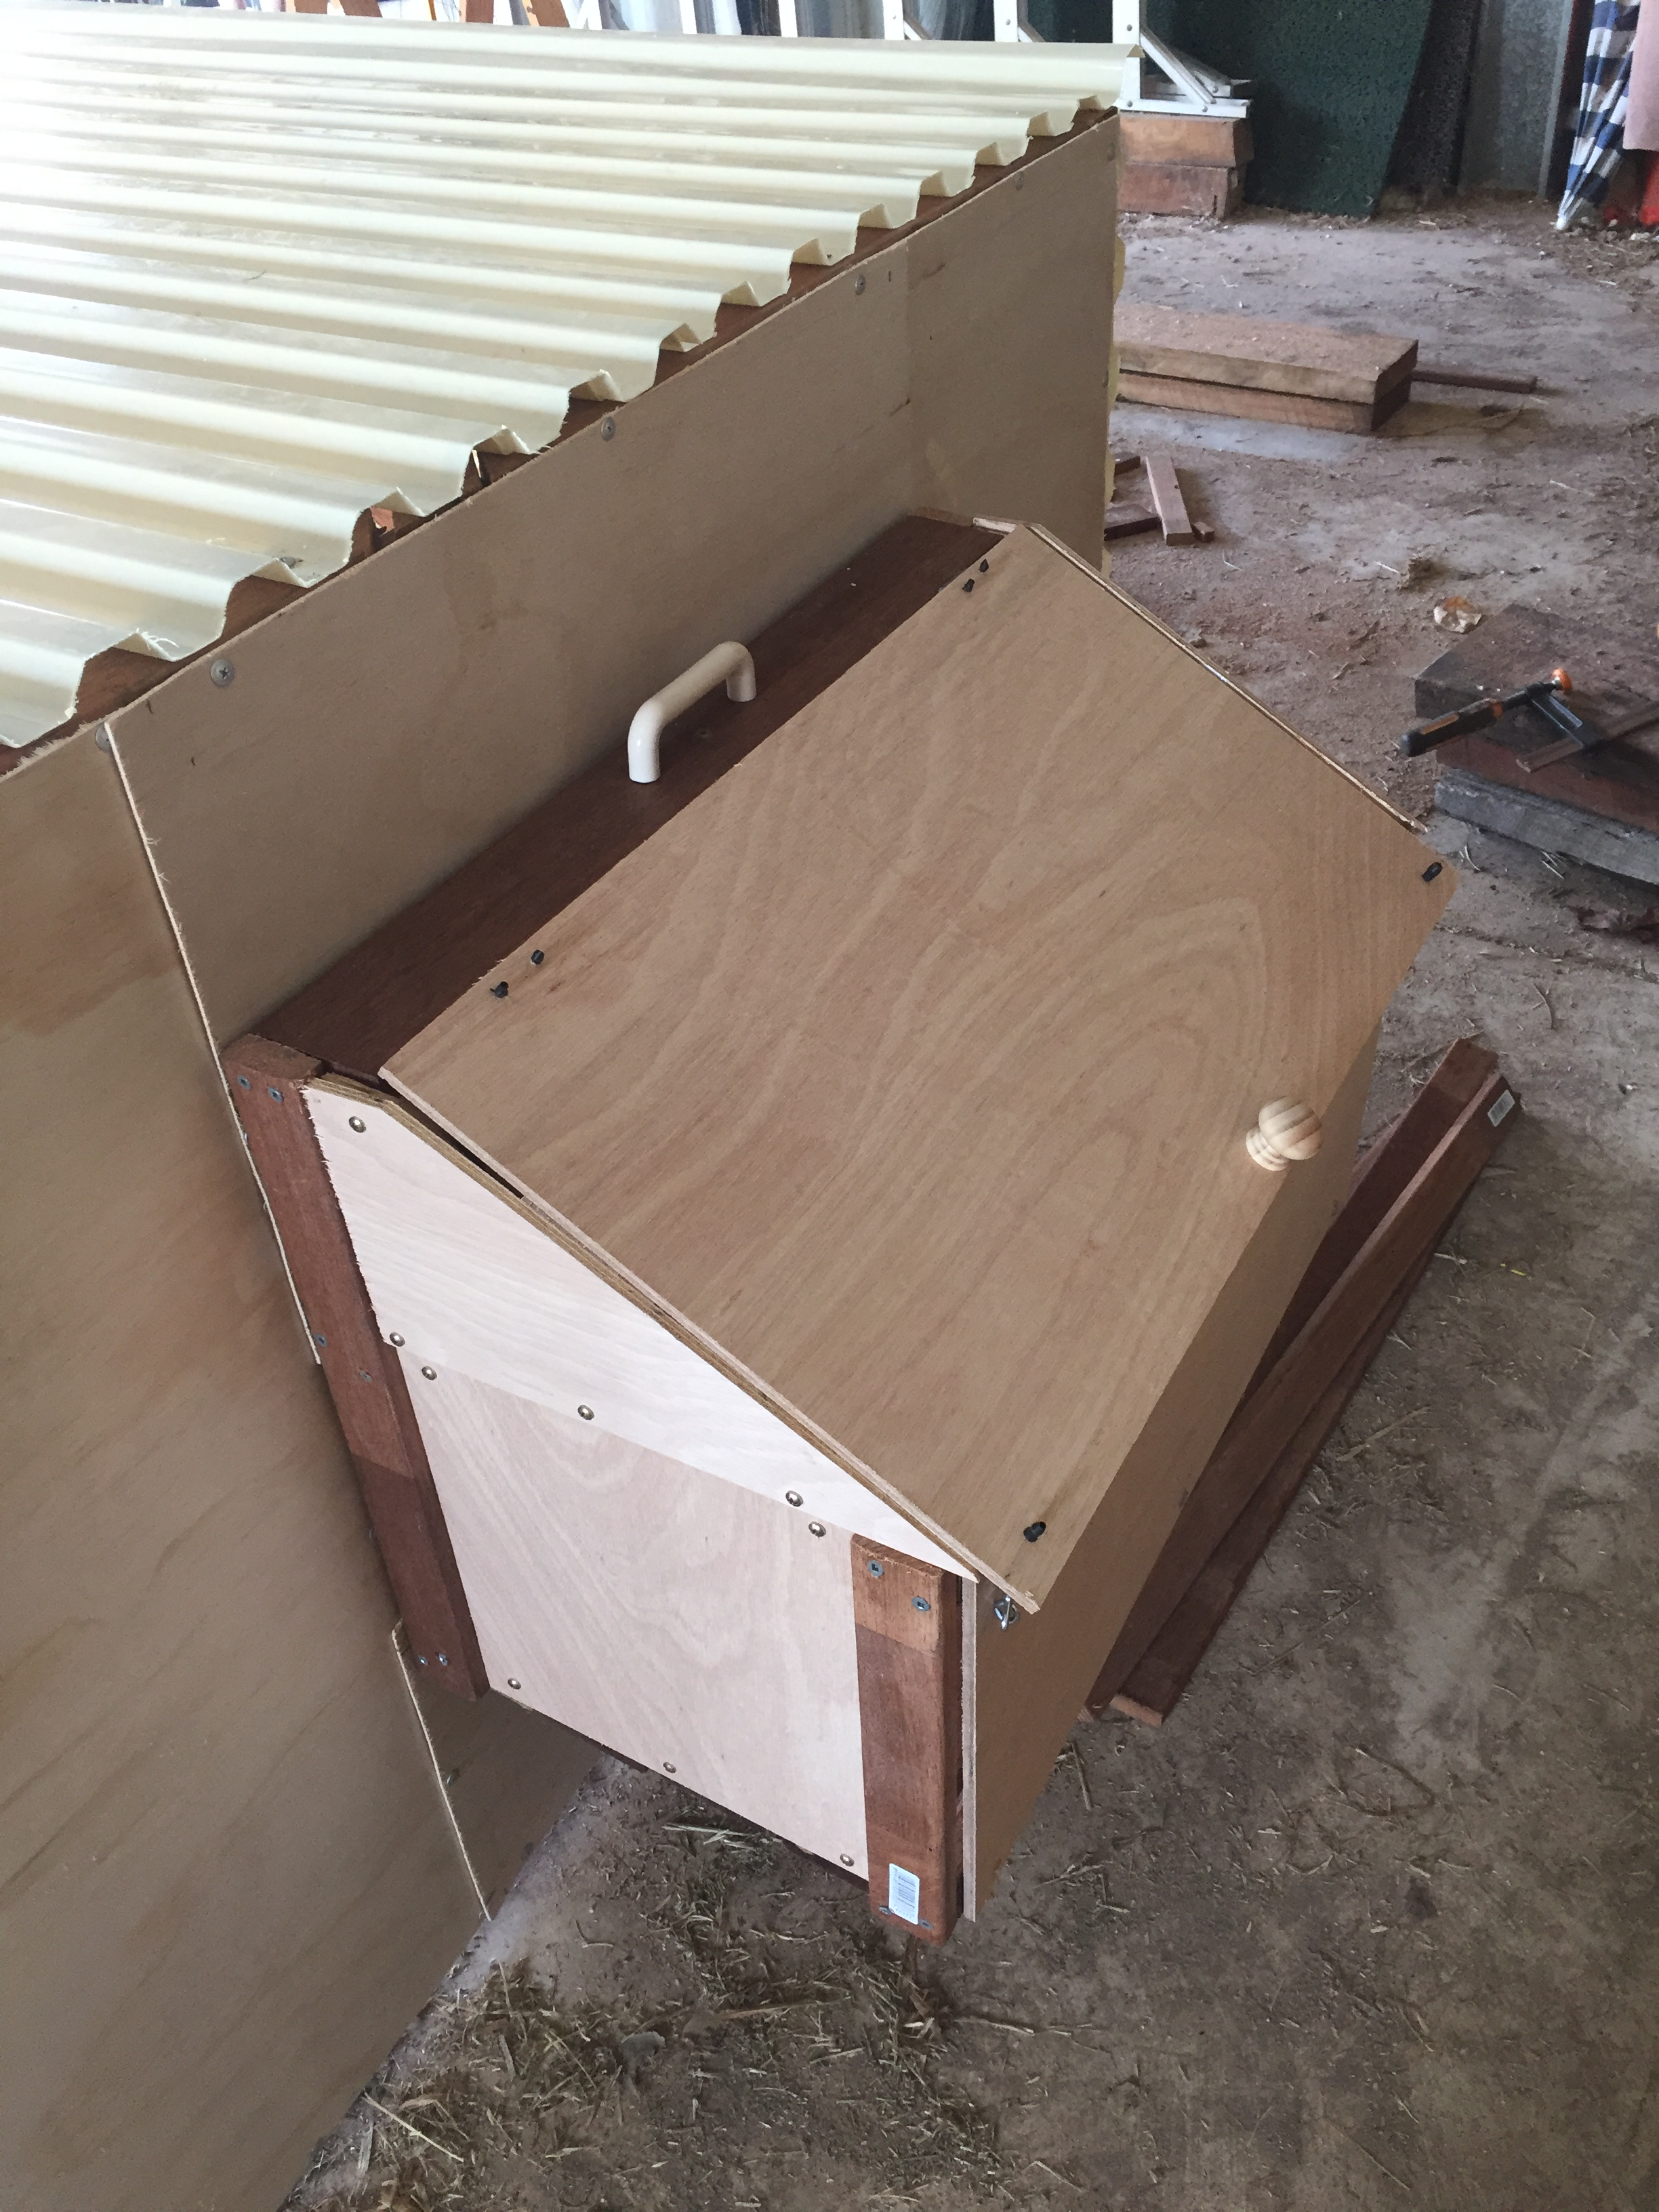 Timeshare – laying box